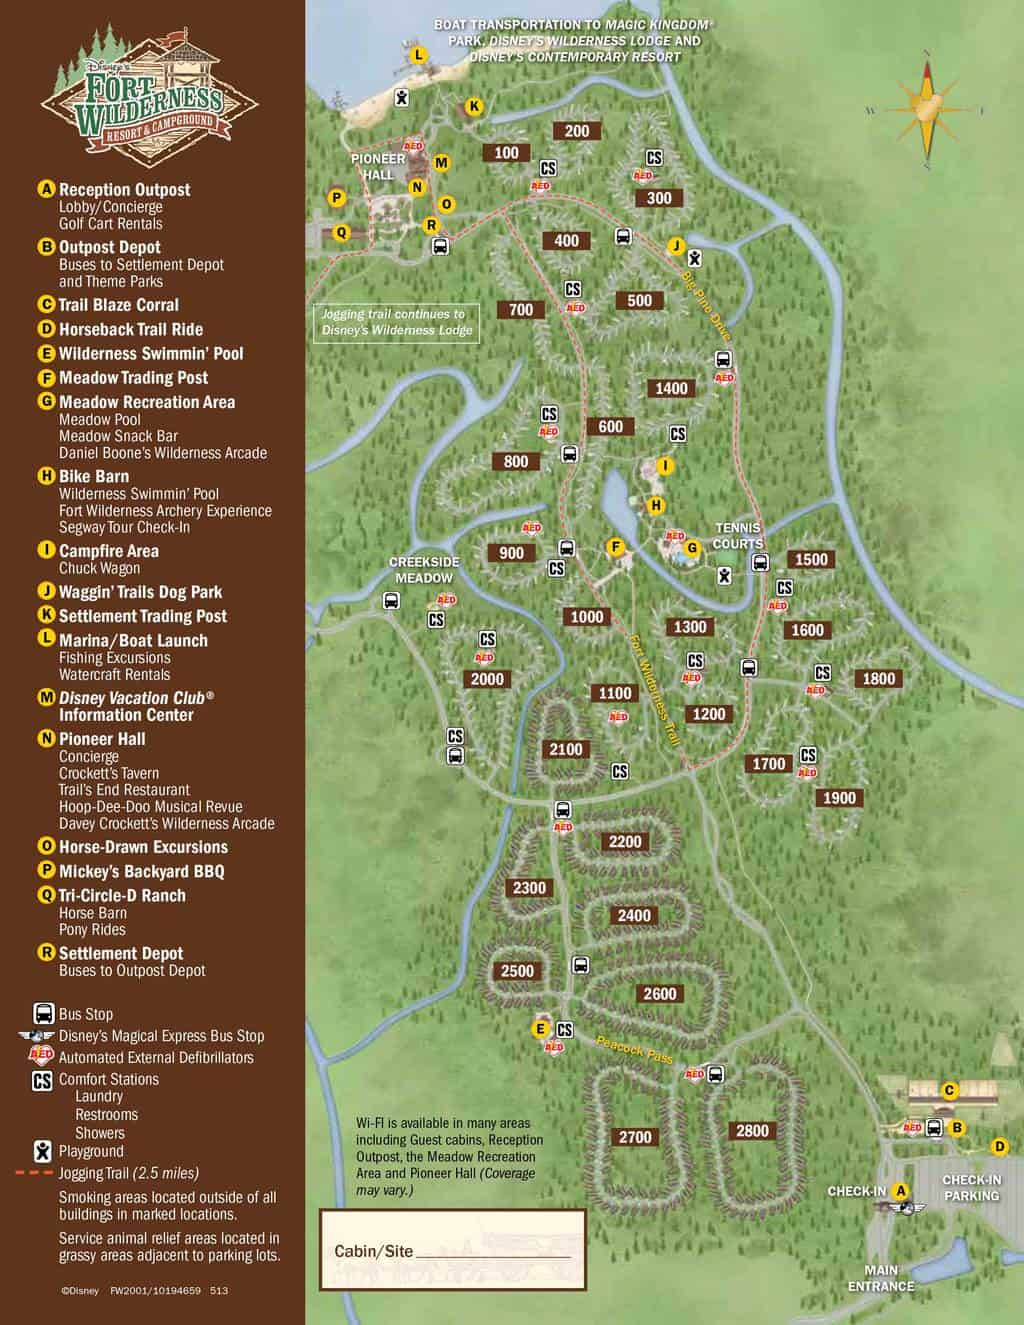 Fort Wilderness Resort Map Kennythepirate Com